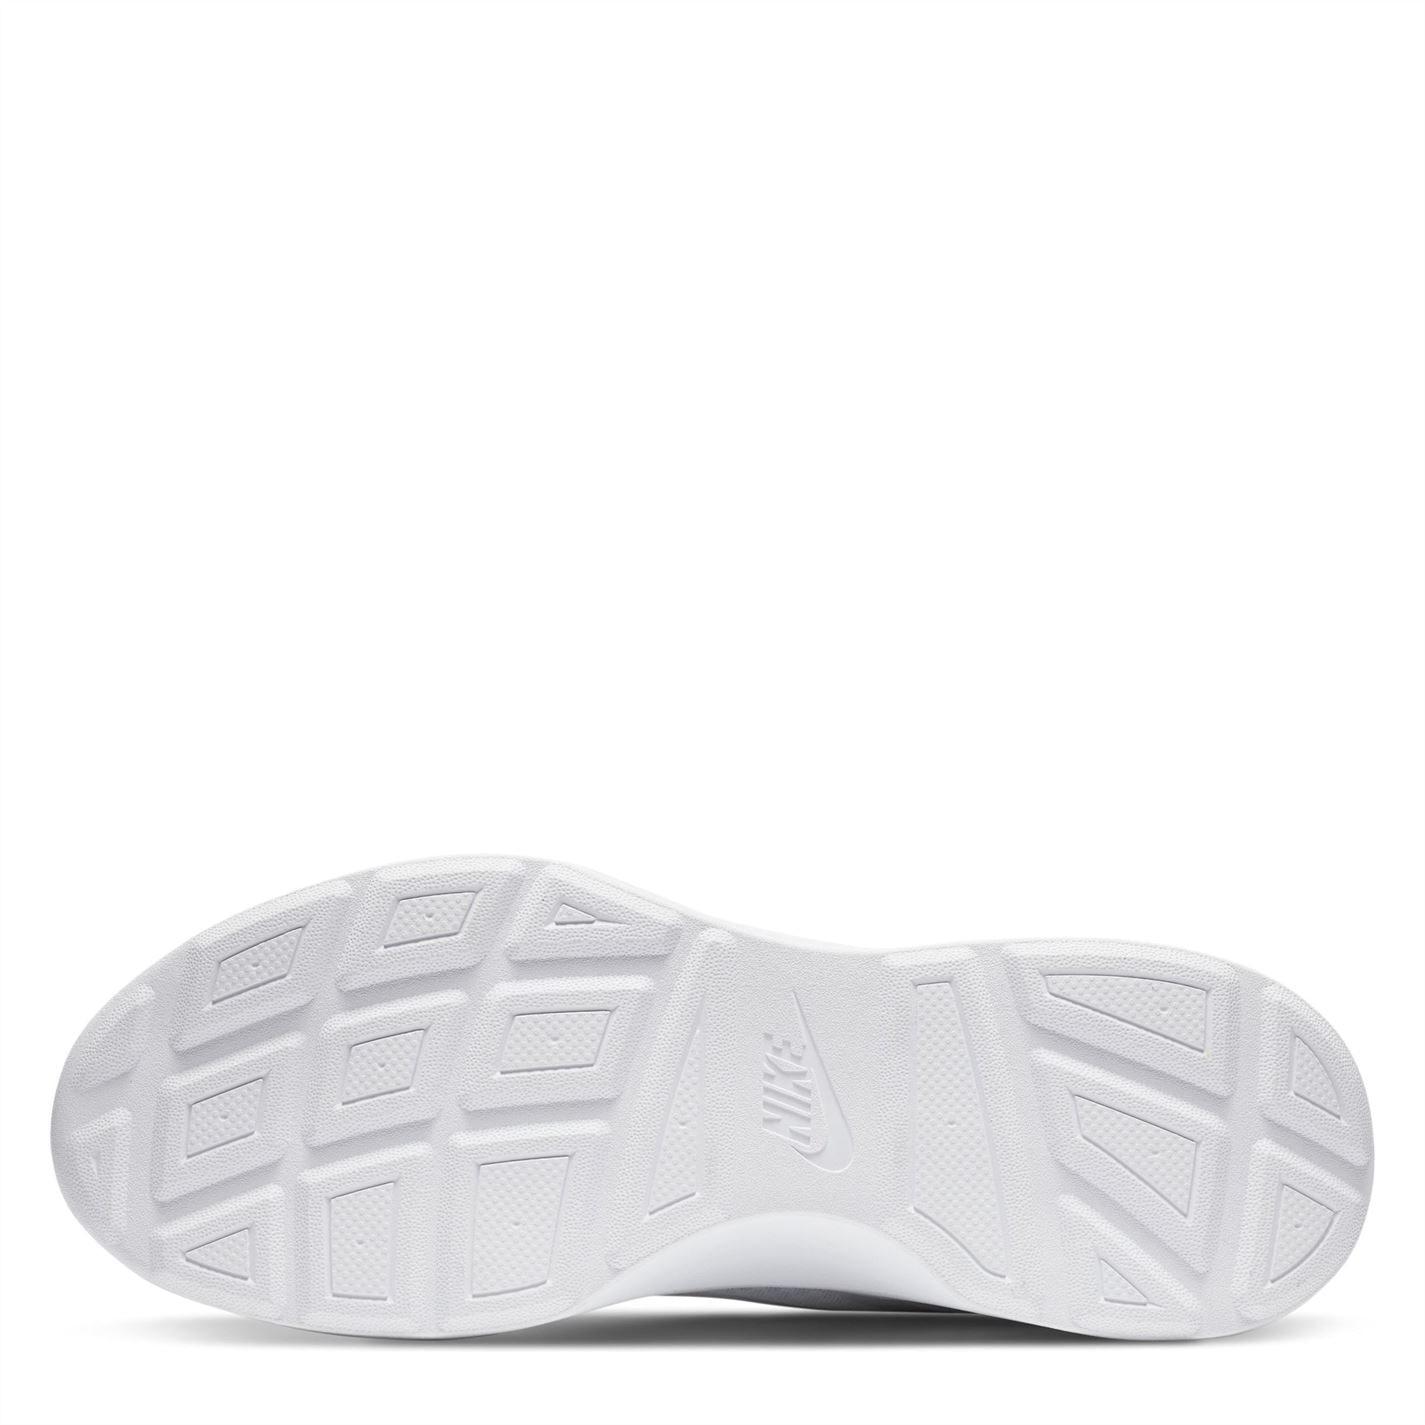 Adidasi sport Nike Wearallday pentru femei alb negru